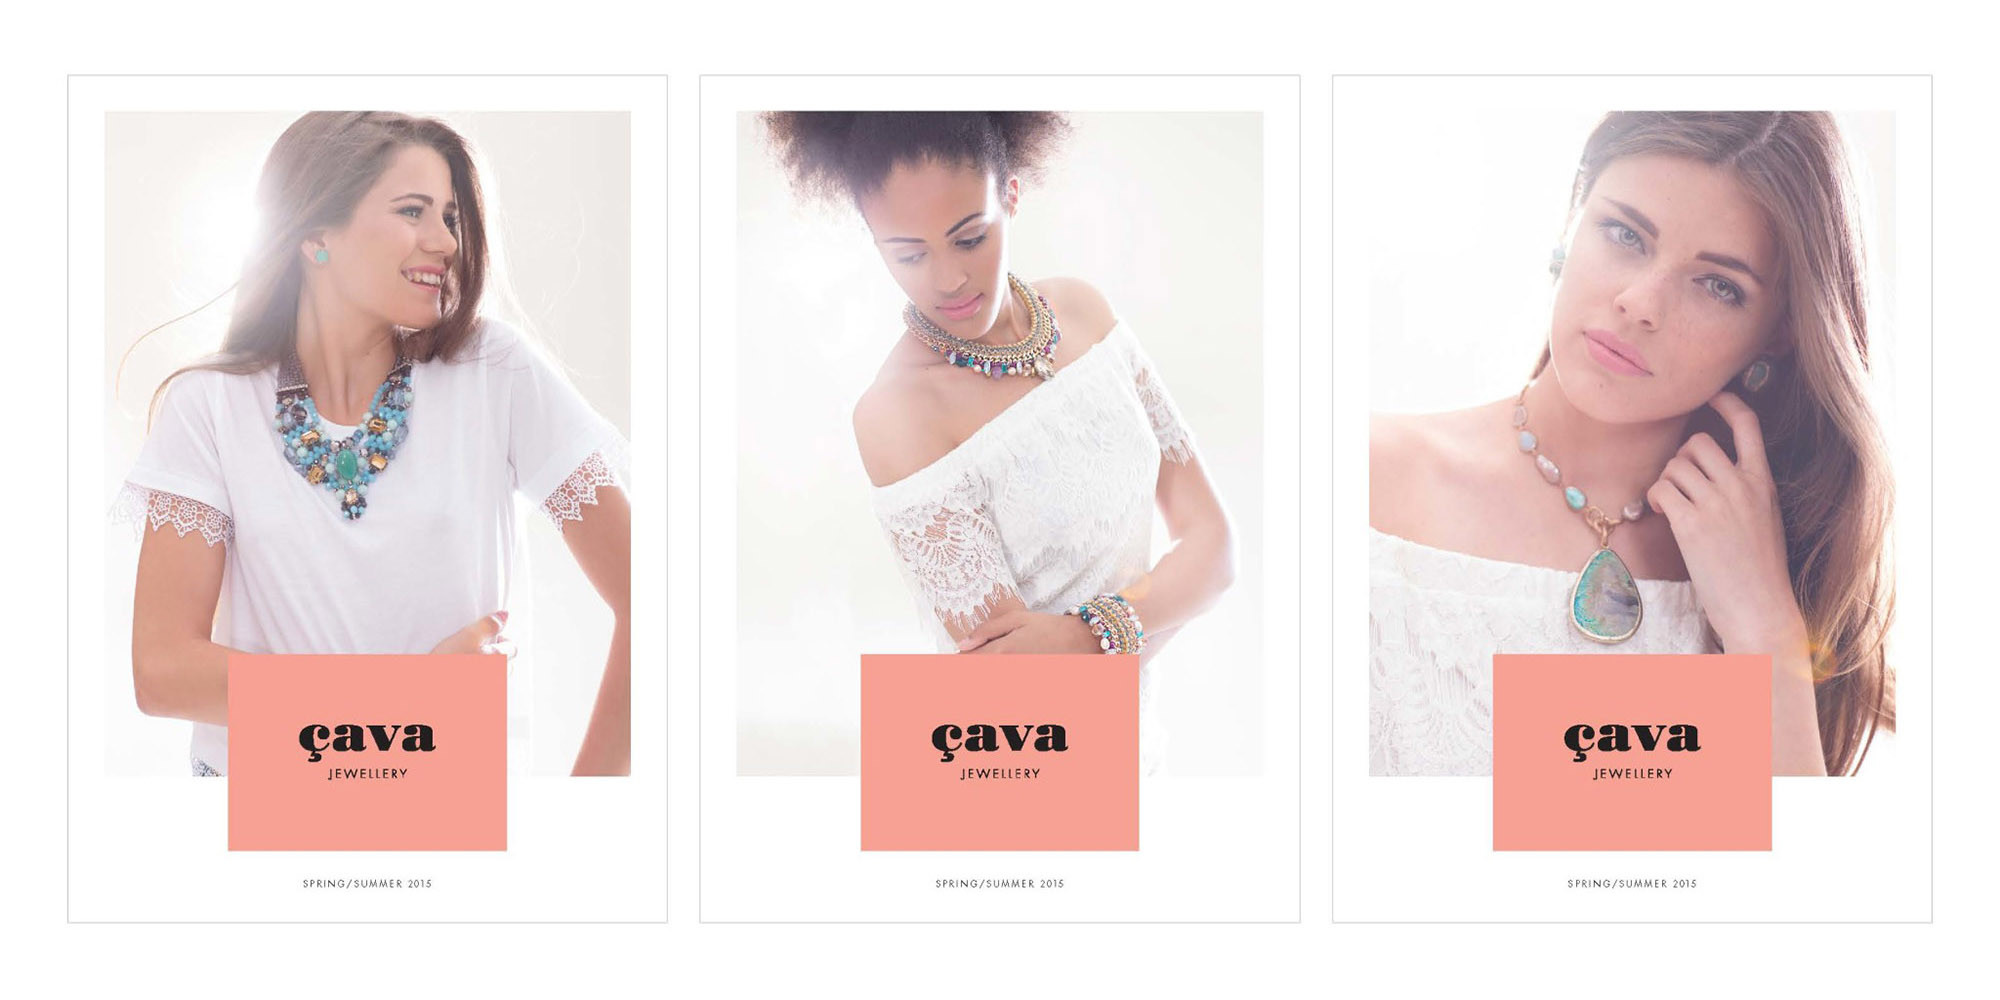 cava-case-study-1140x800px-1_page_09